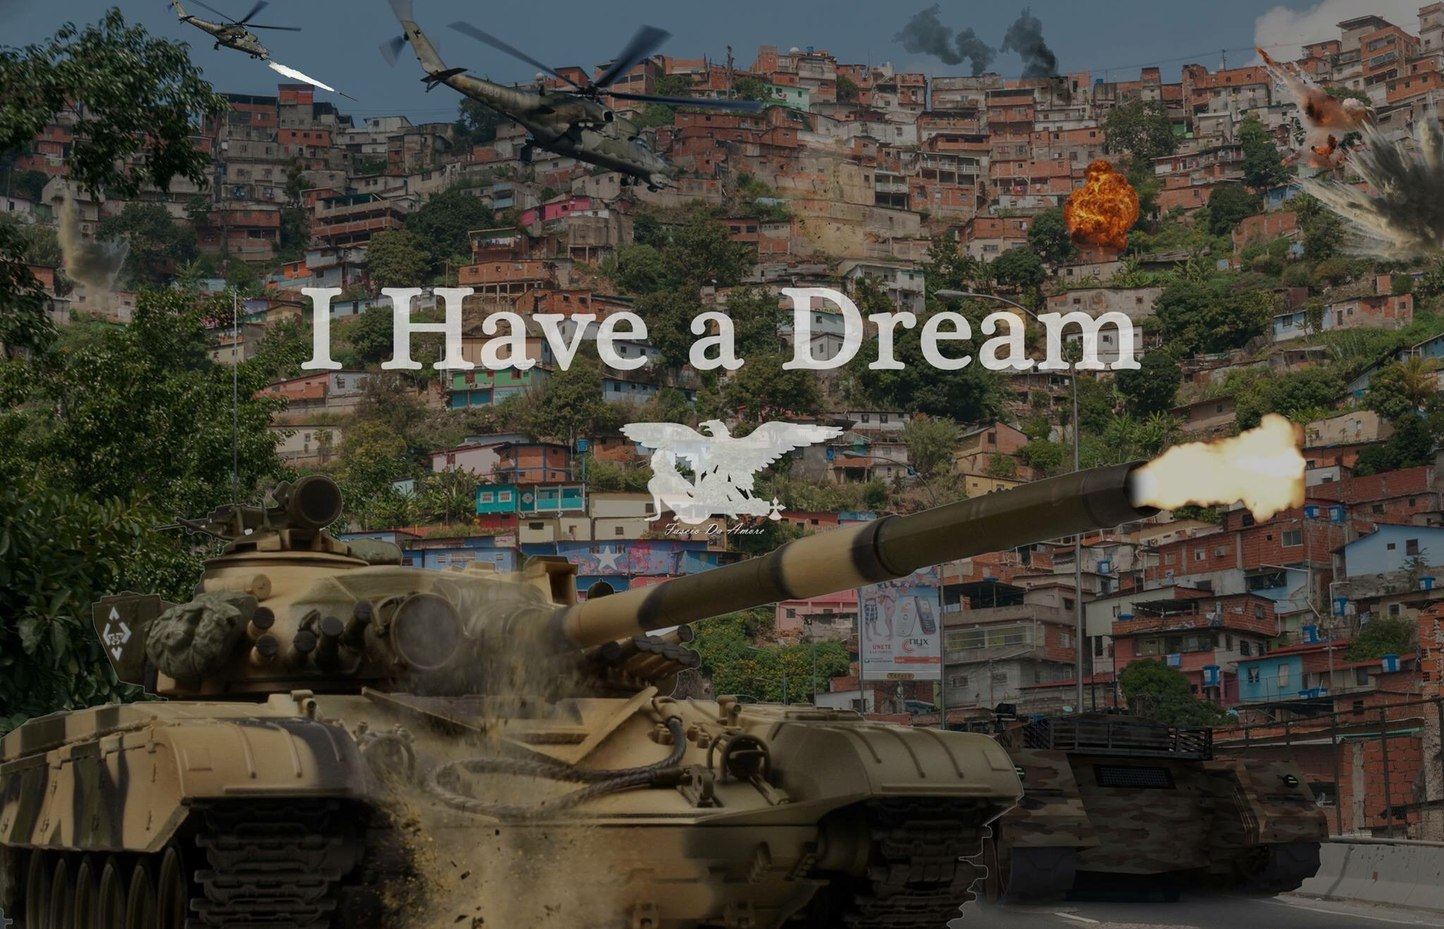 soh bora destruir a favela - meme